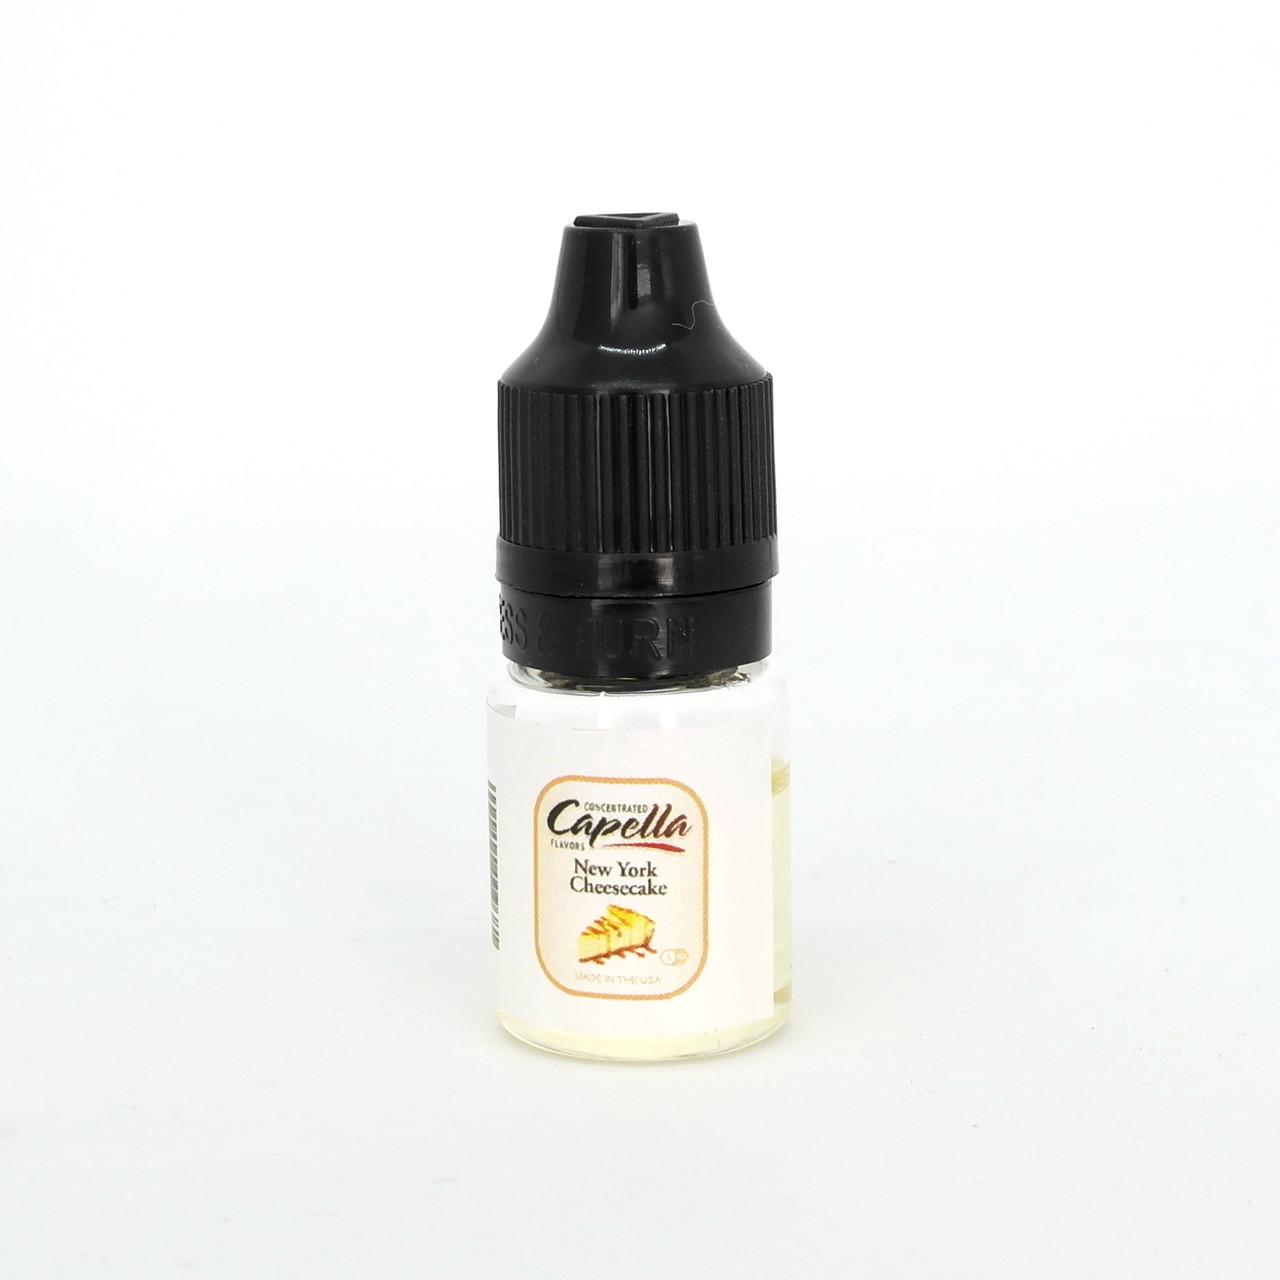 Ароматизатор Capella New York Cheesecake (Чизкейк) 5 мл. (0220)